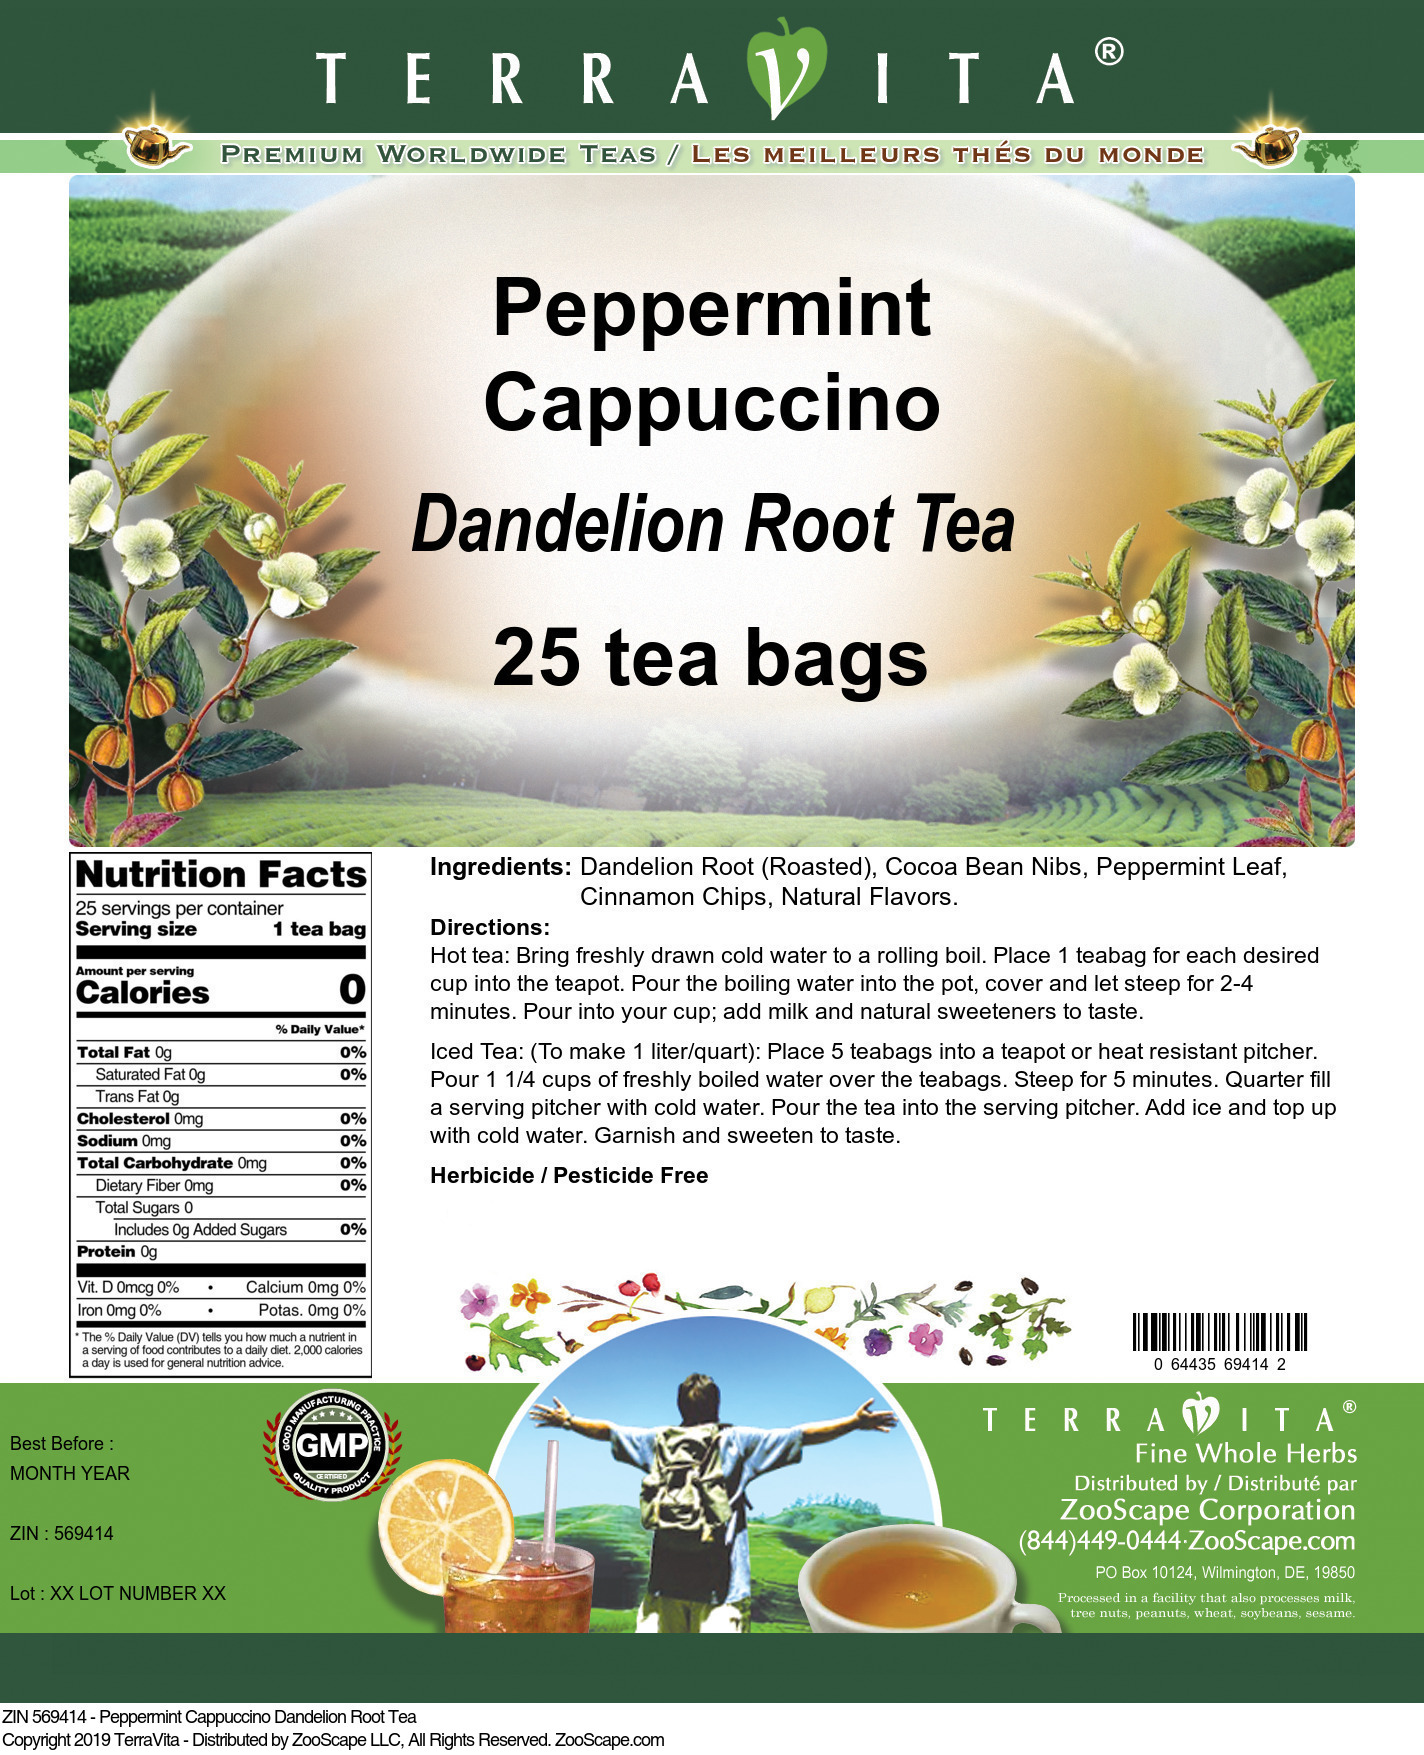 Peppermint Cappuccino Dandelion Root